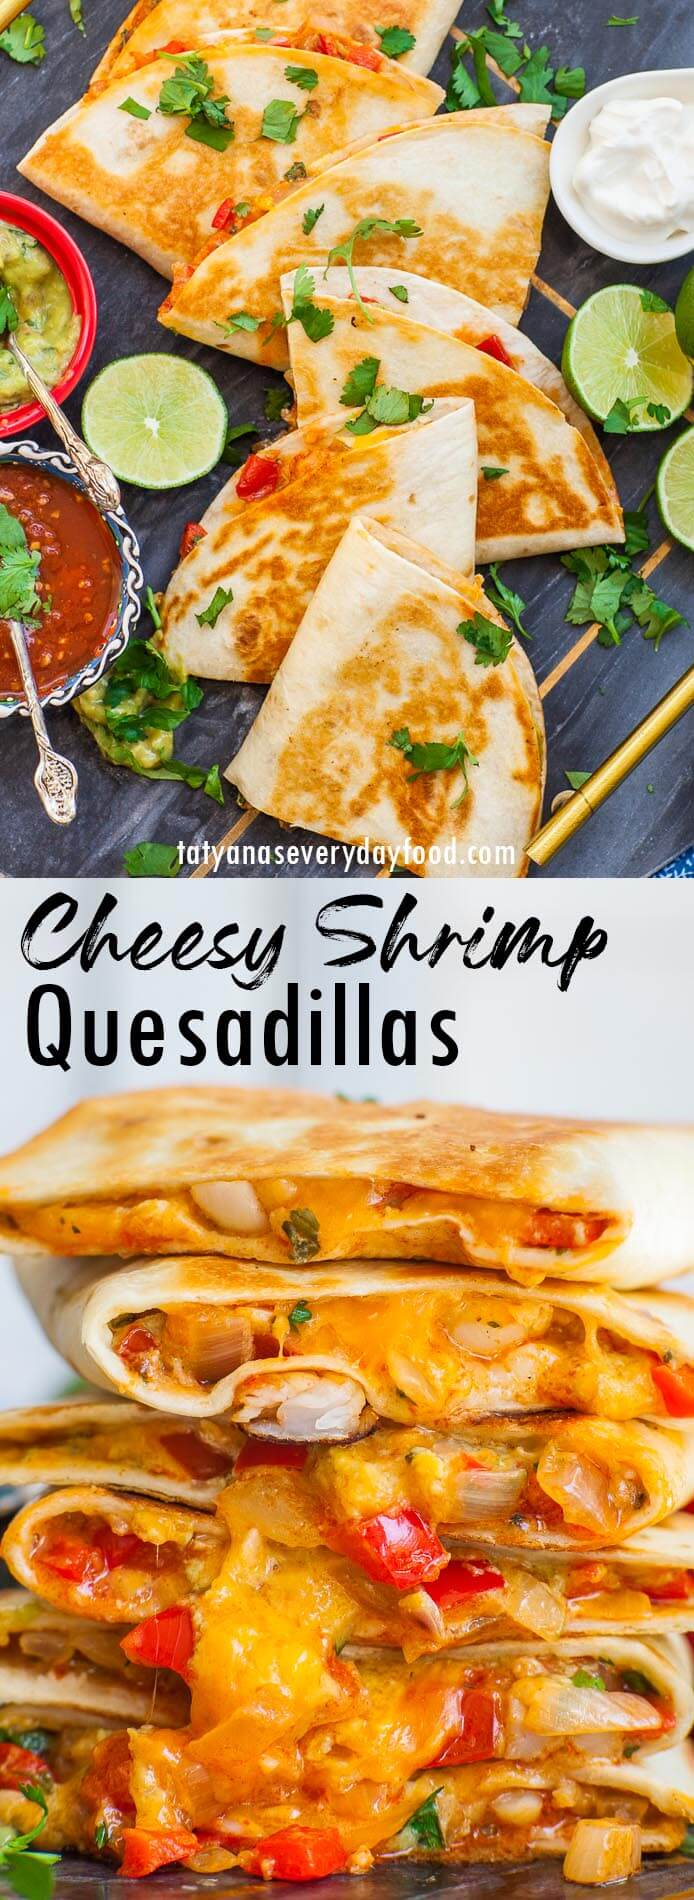 Cheesy Shrimp Quesadillas video recipe board